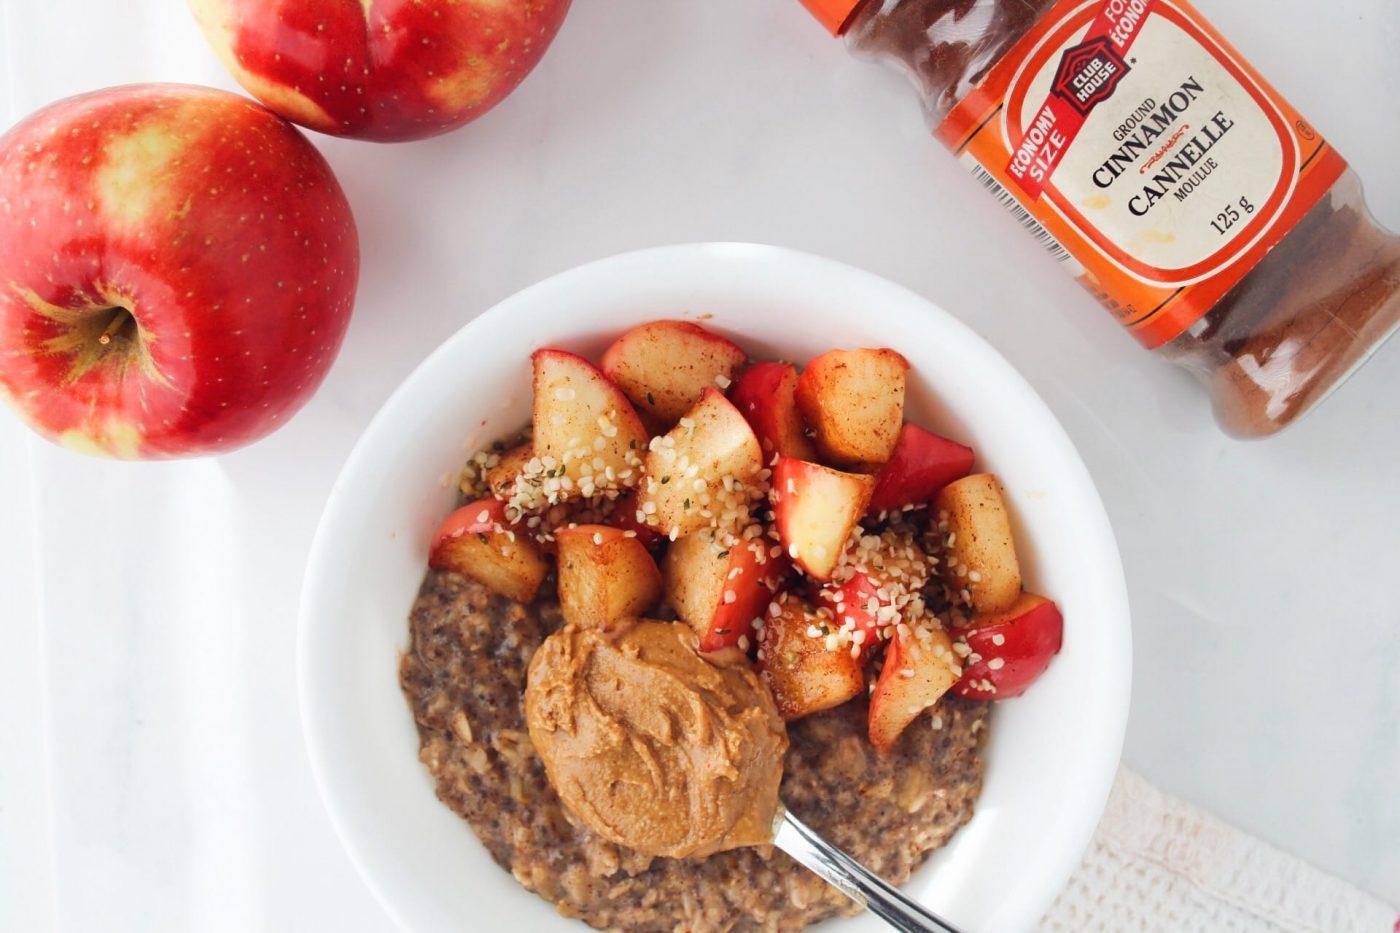 Spiced Oatmeal with Warm Cinnamon Apples